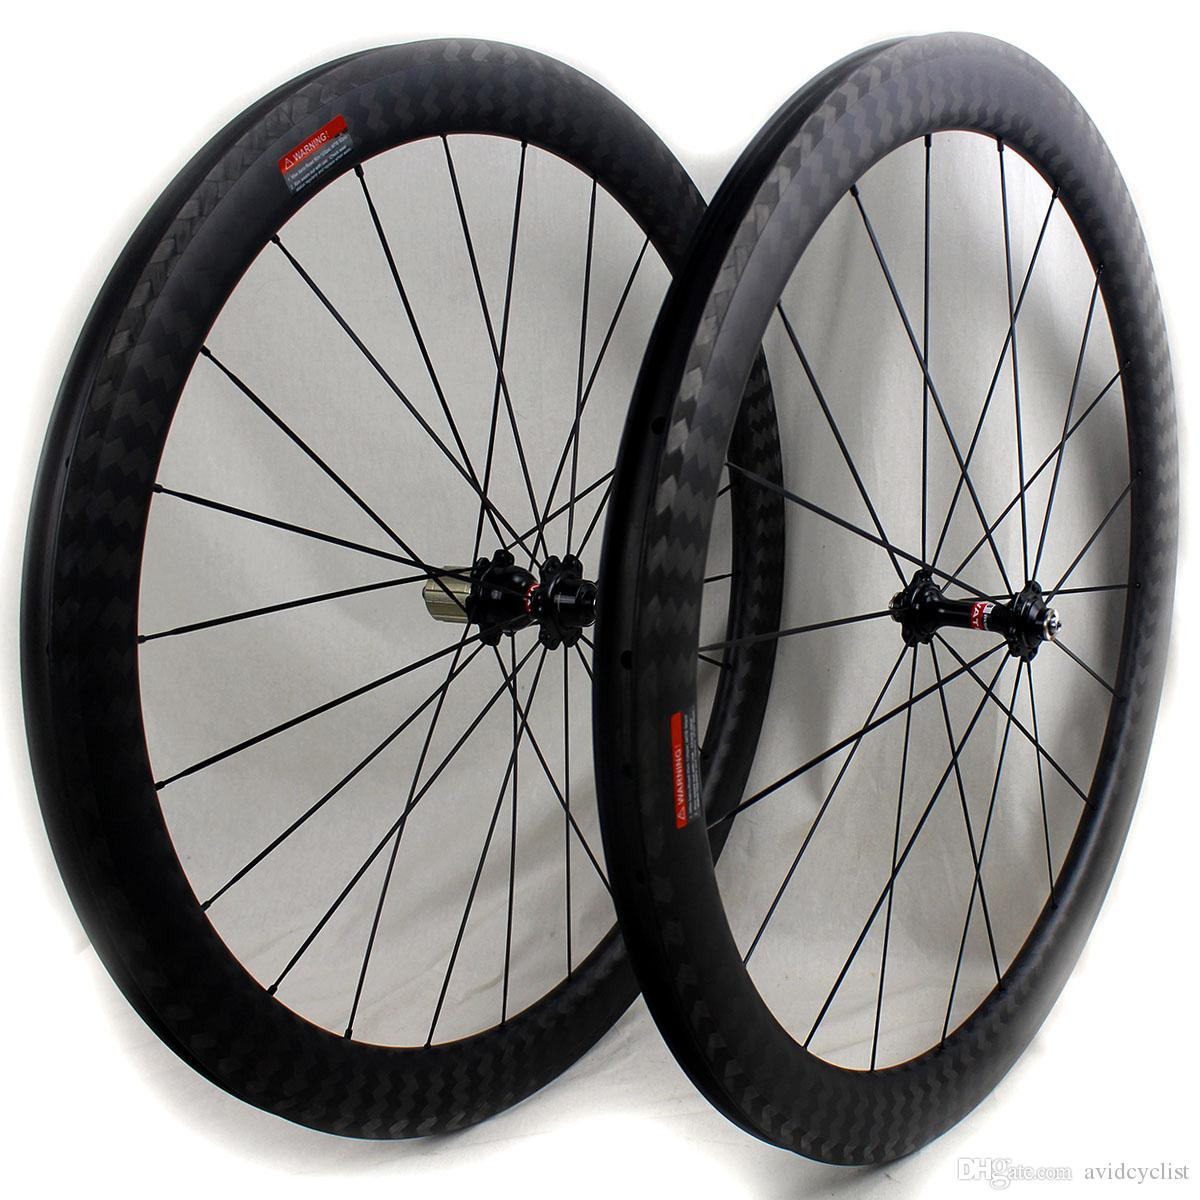 Carbon fiber rim 700c clincher 38mm carbon road//track bike rims 25mm premium rim